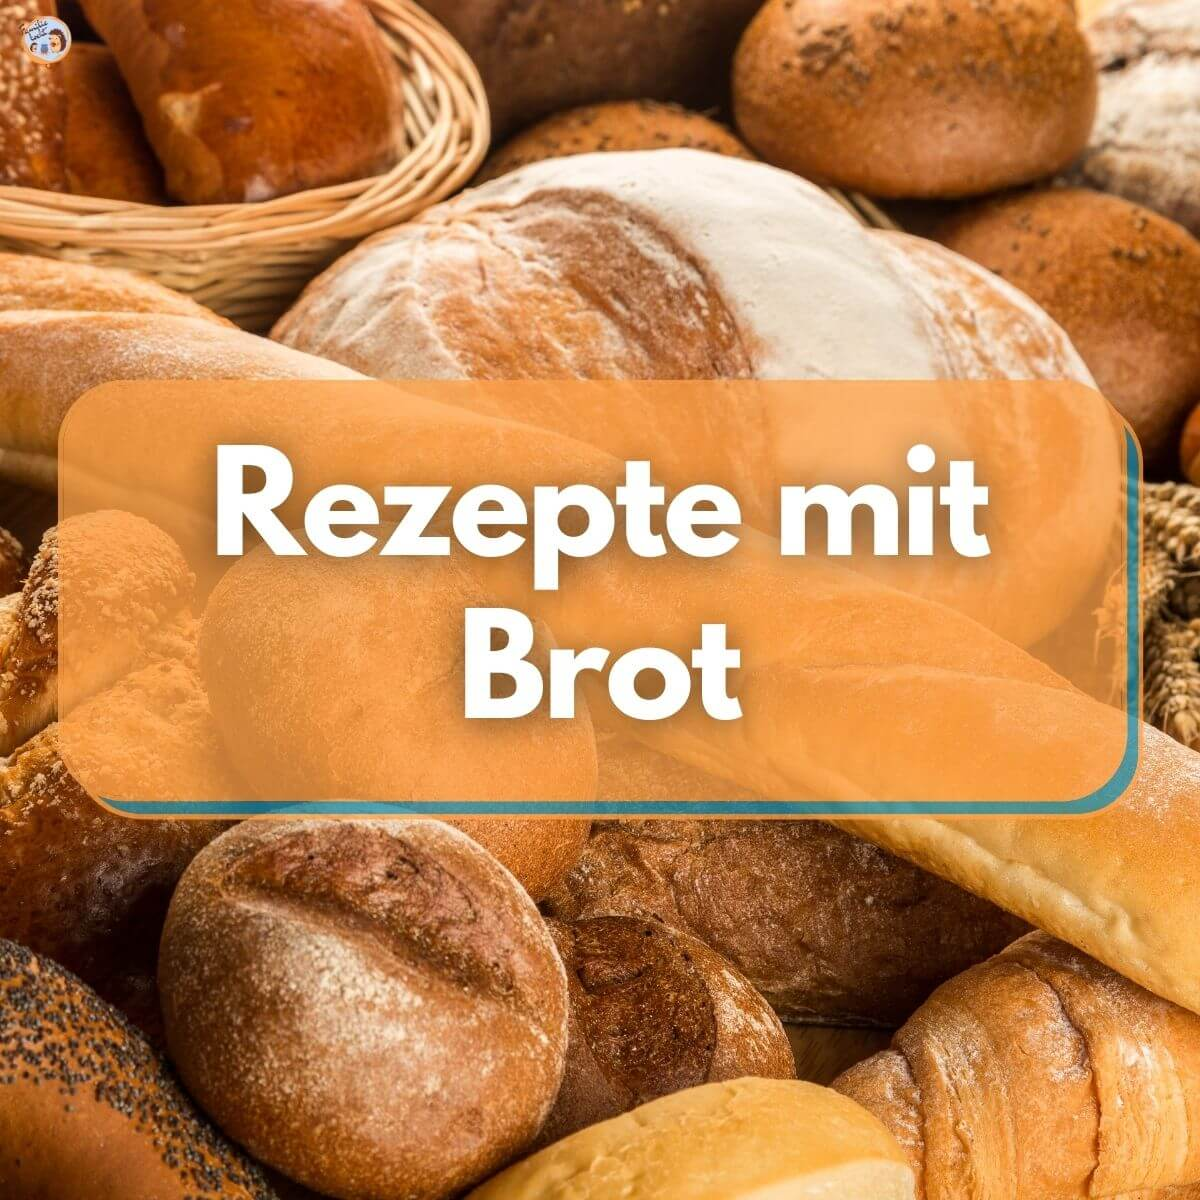 Rezepte mit Brot